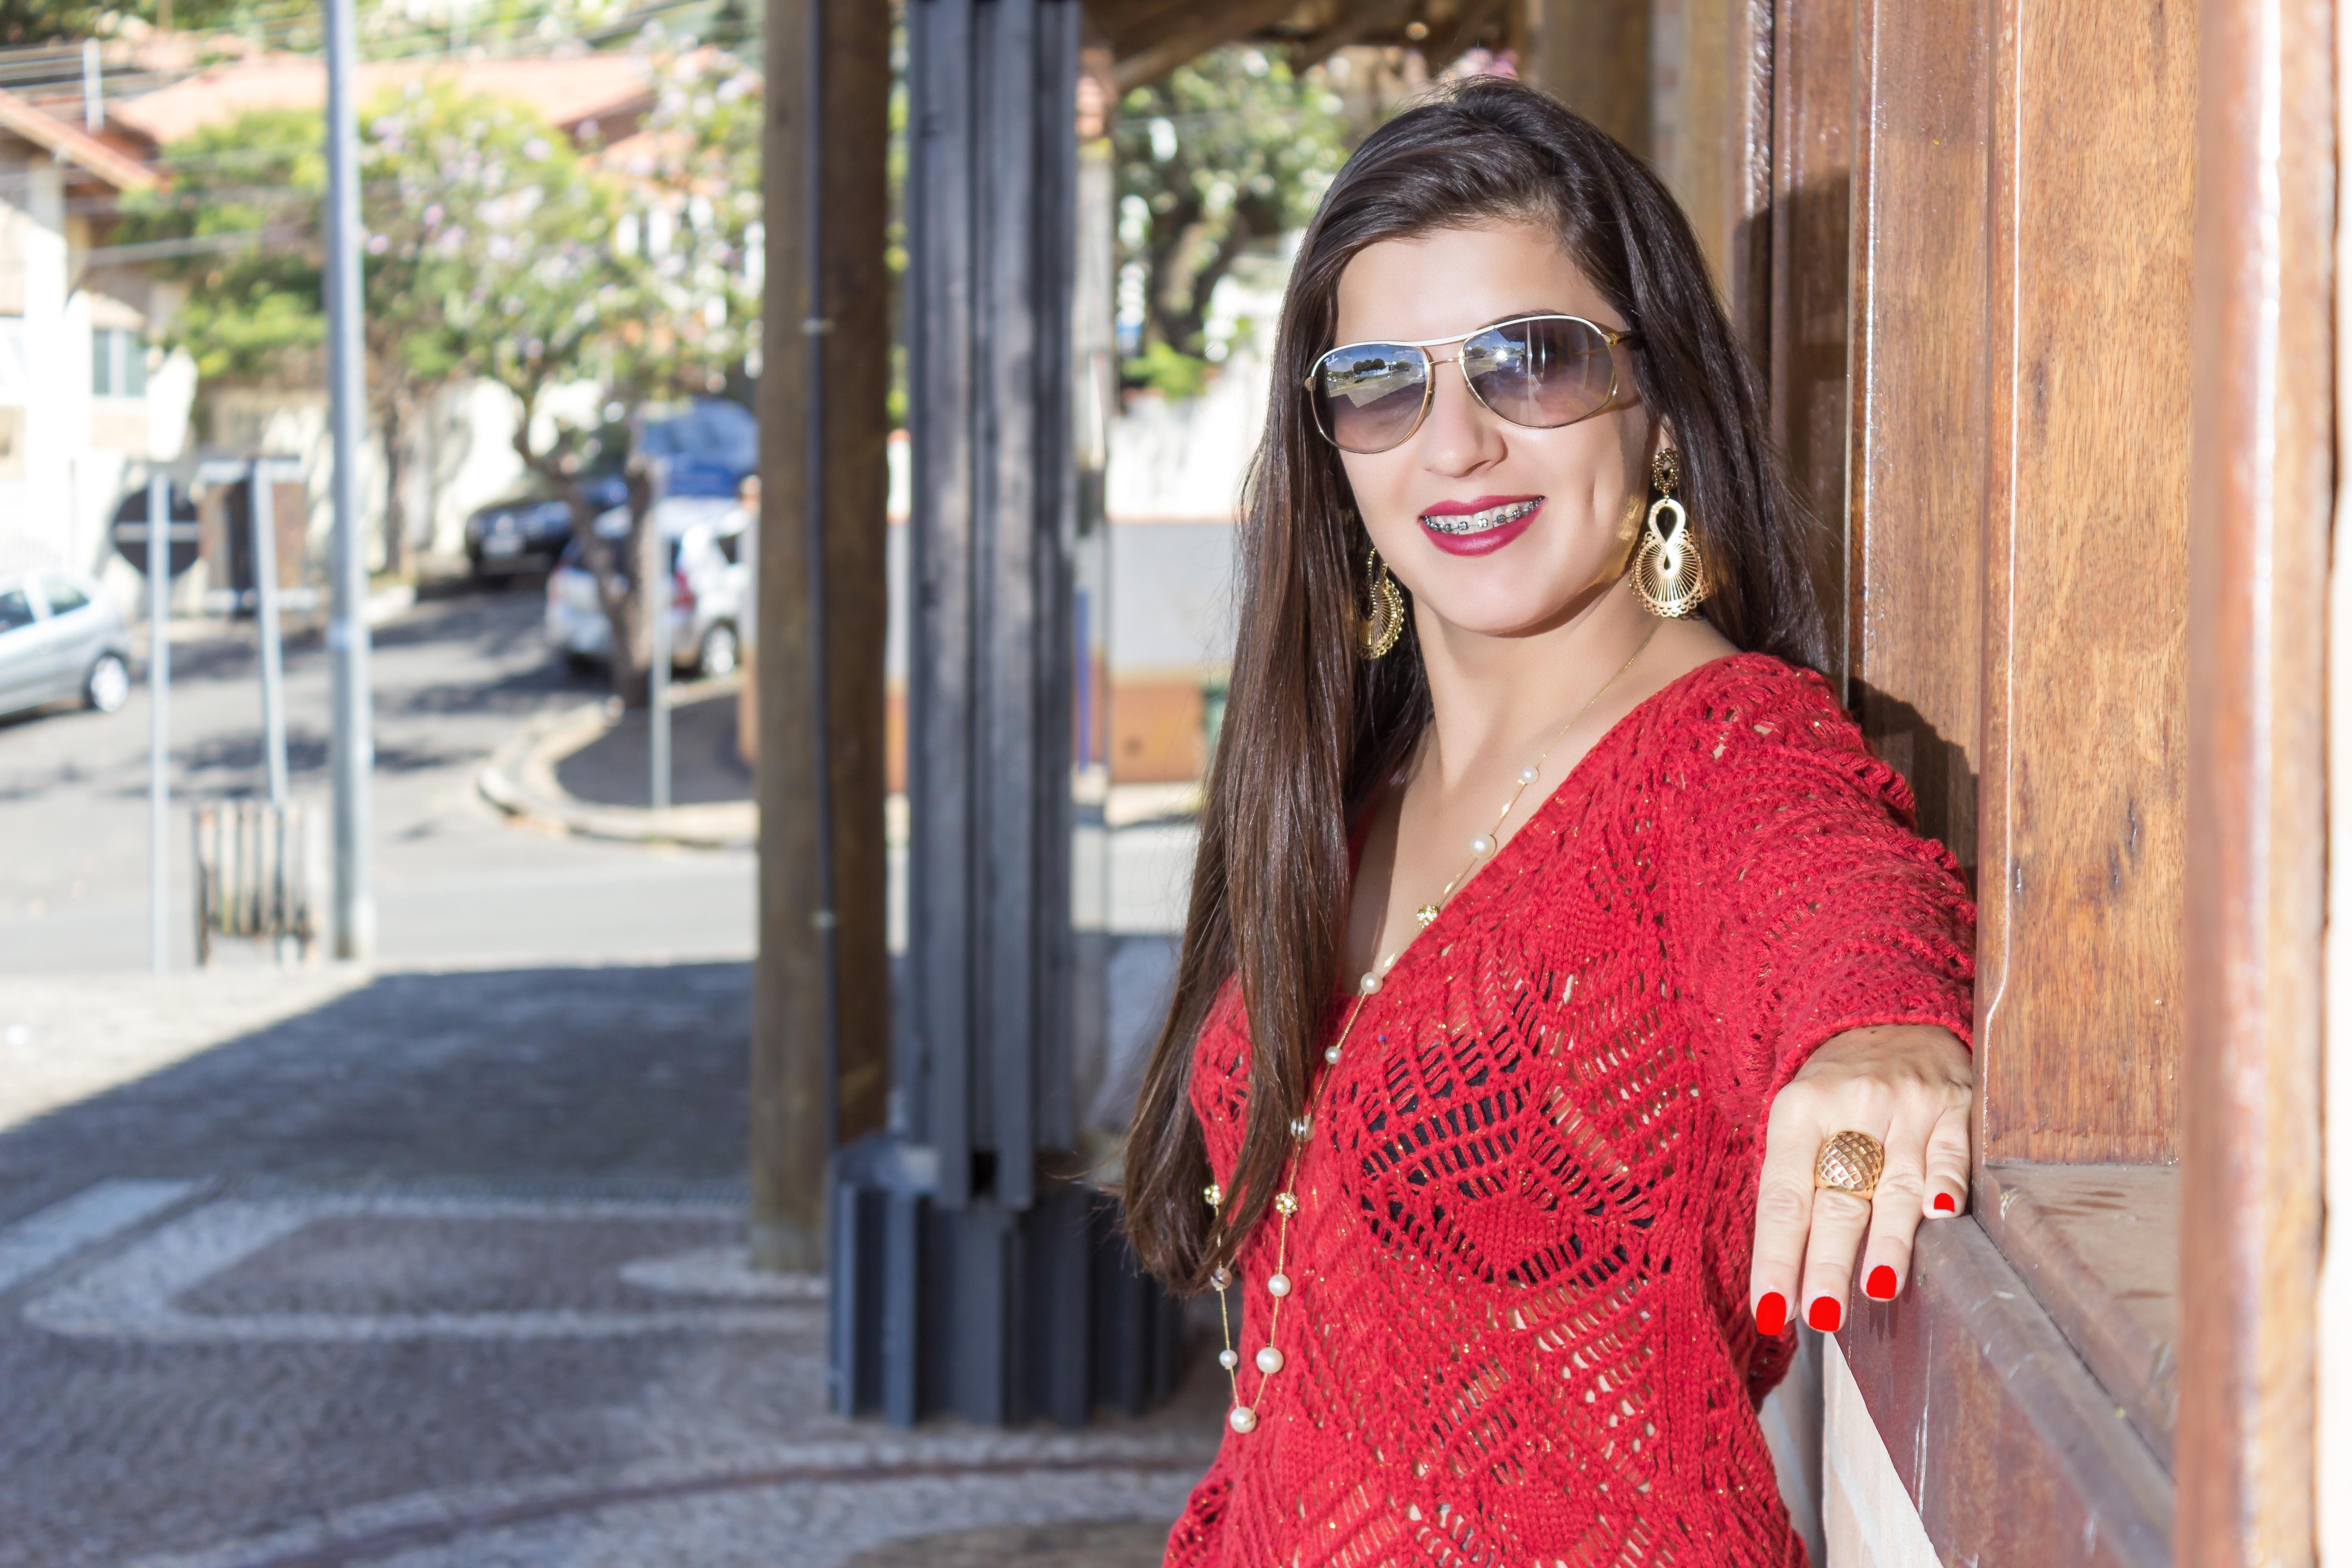 Rita Scarano